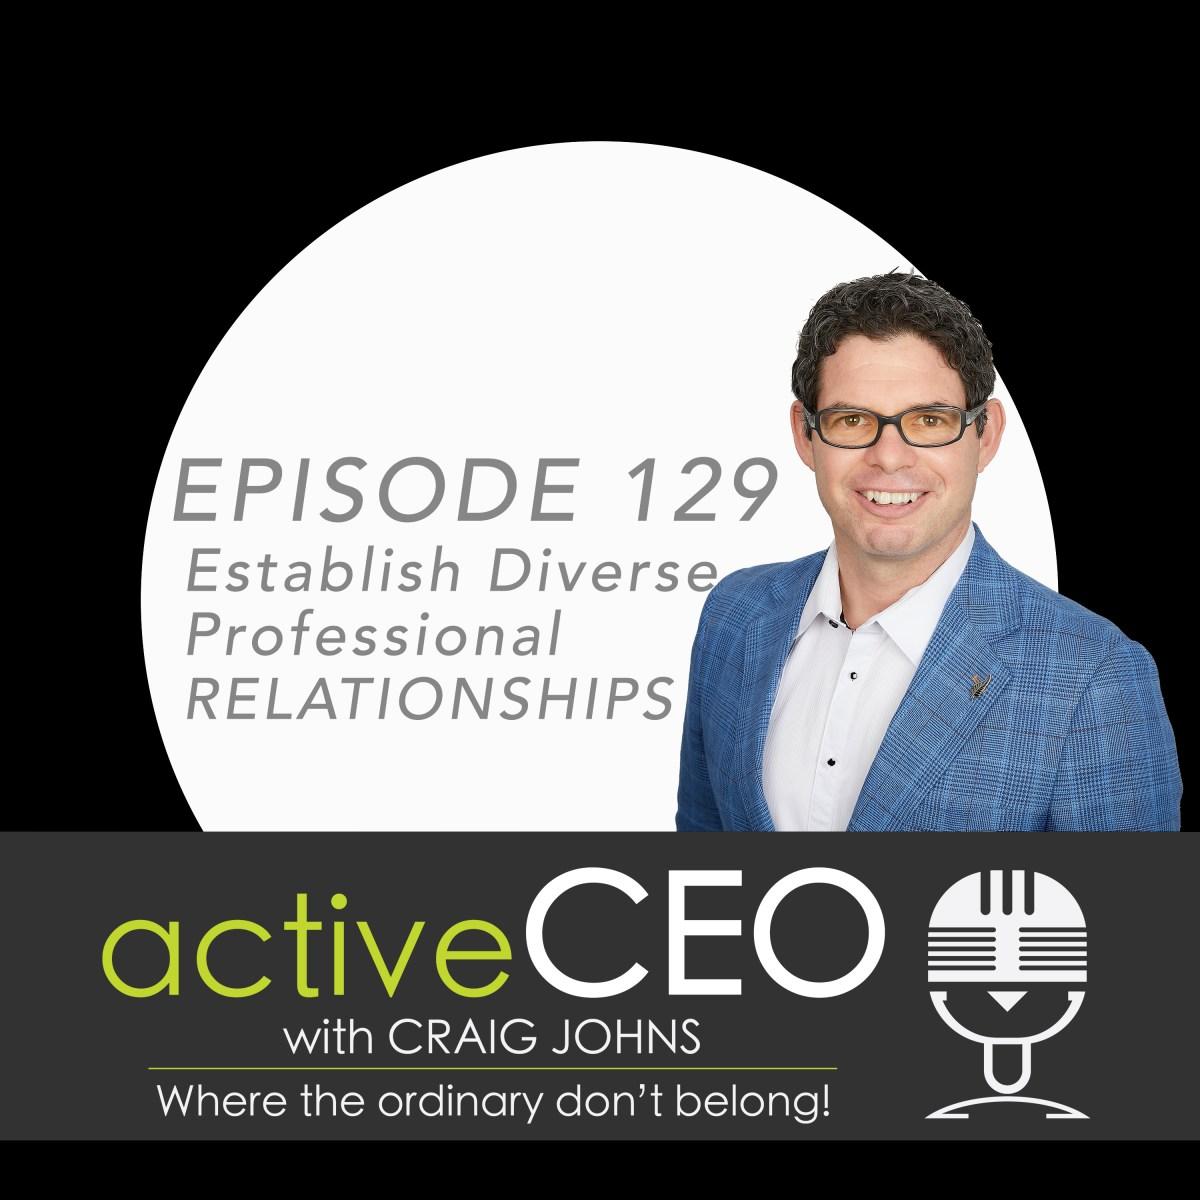 active CEO Podcast 129 Craig Johns Establish Diverse Professional Relationships